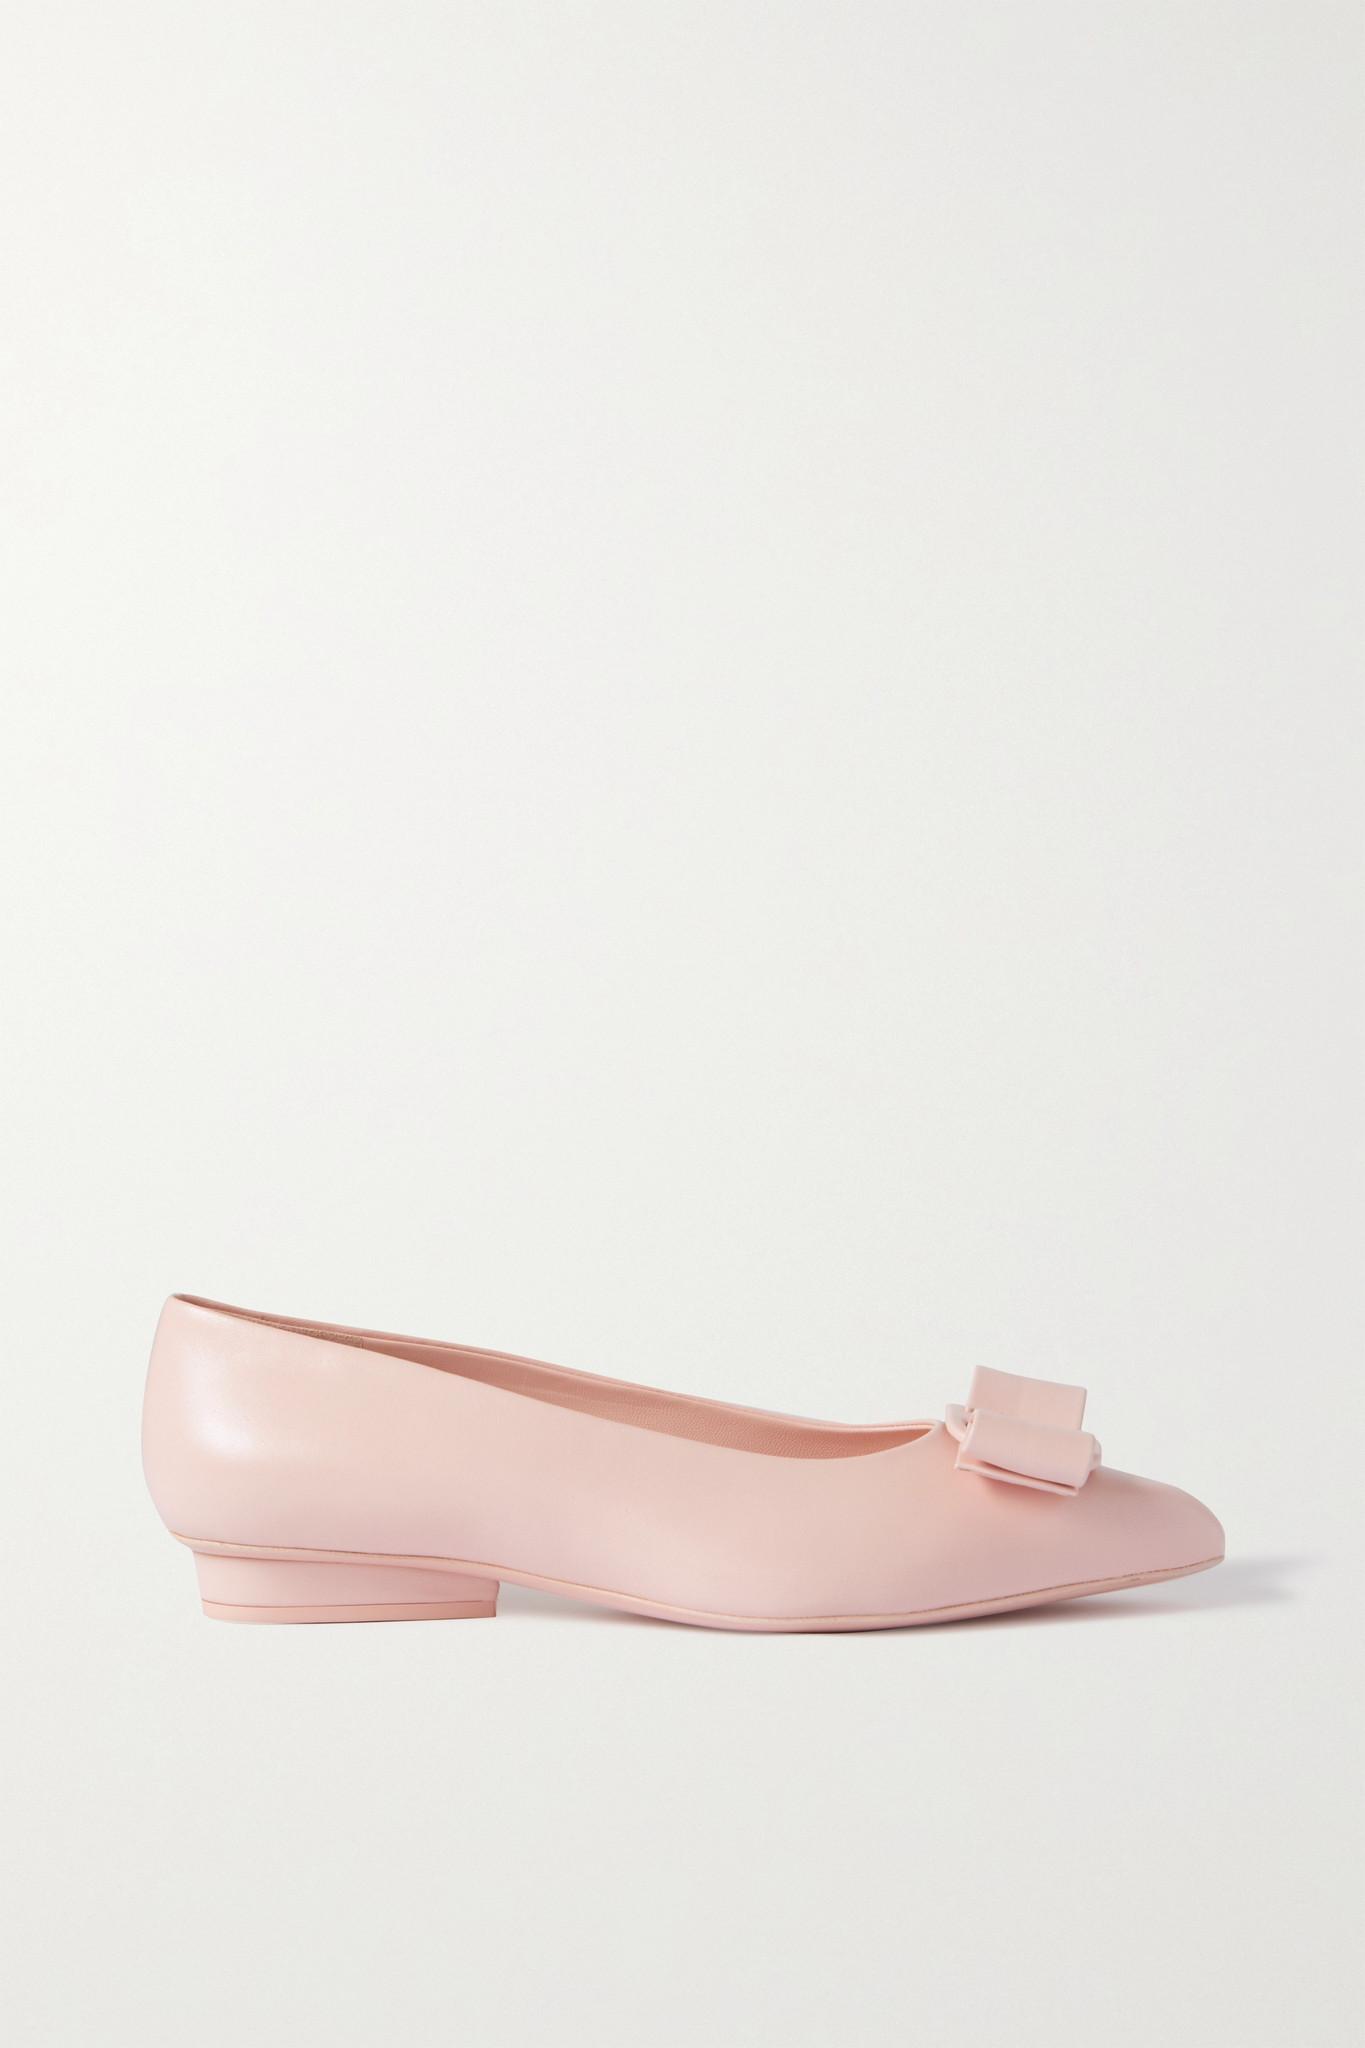 SALVATORE FERRAGAMO - Viva 蝴蝶结缀饰皮革尖头浅口鞋 - 粉红色 - US7.5